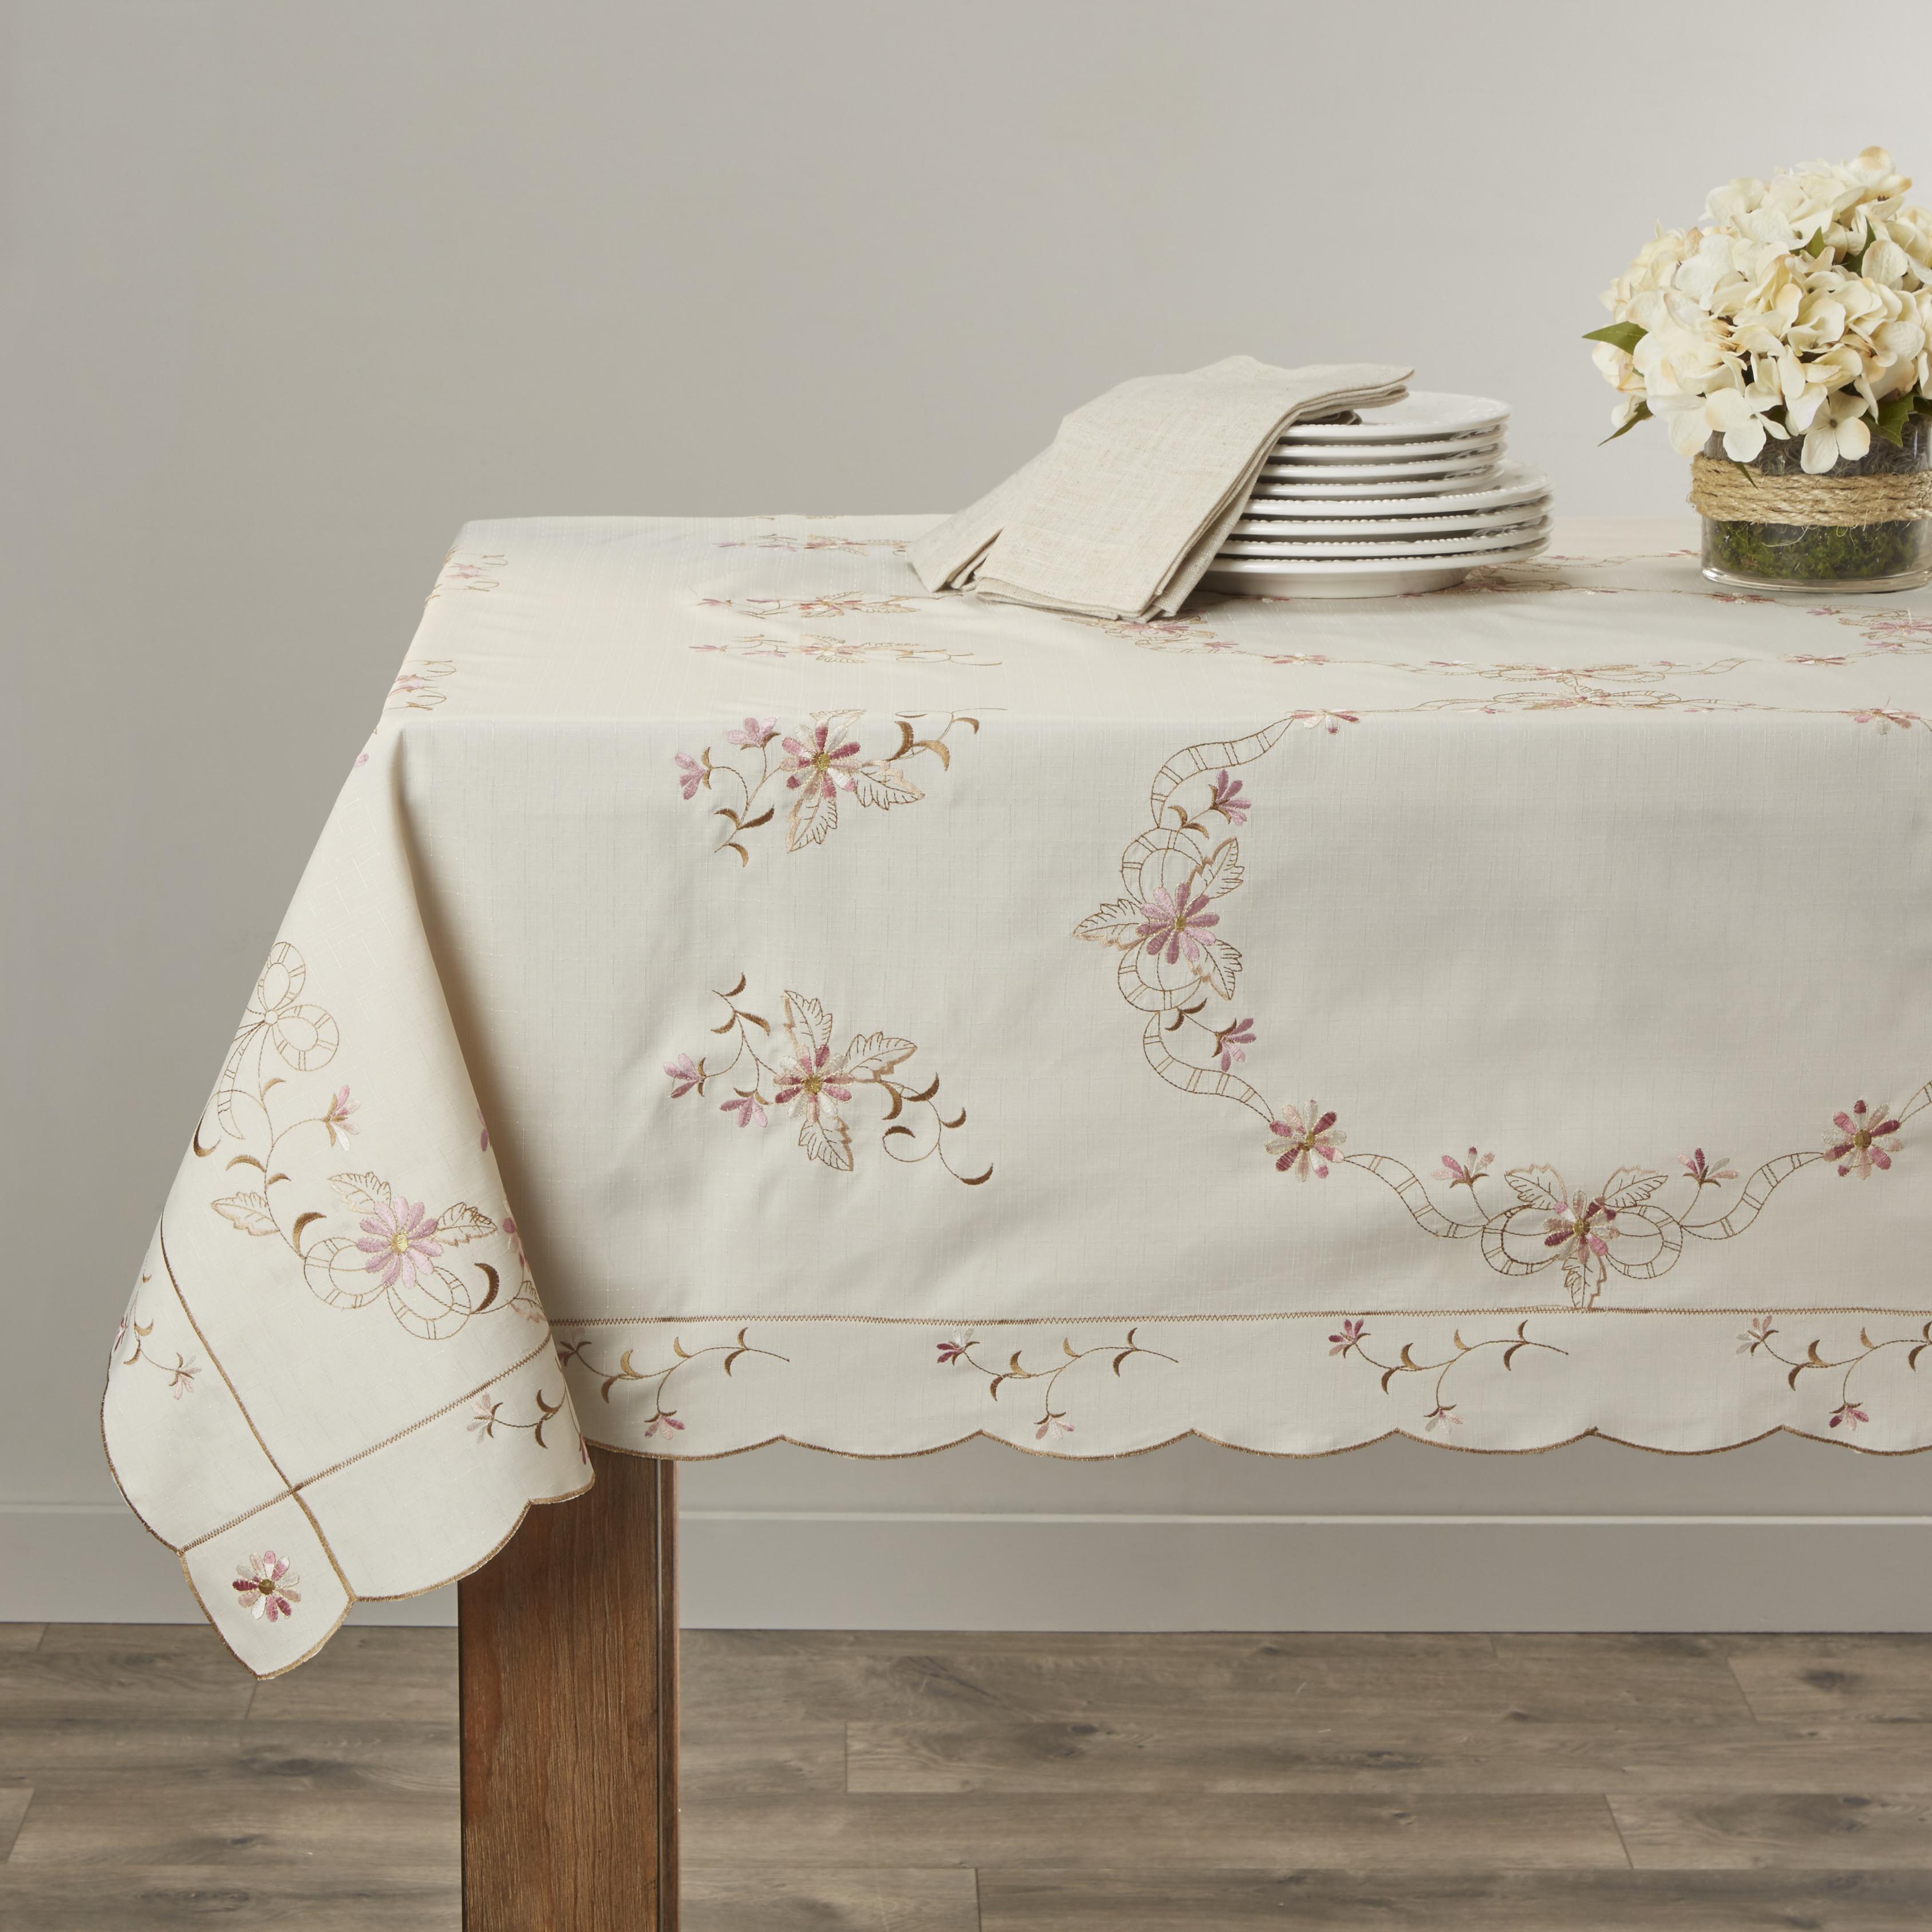 Renaissance Embroidered Design Tablecloths by Violet Linen